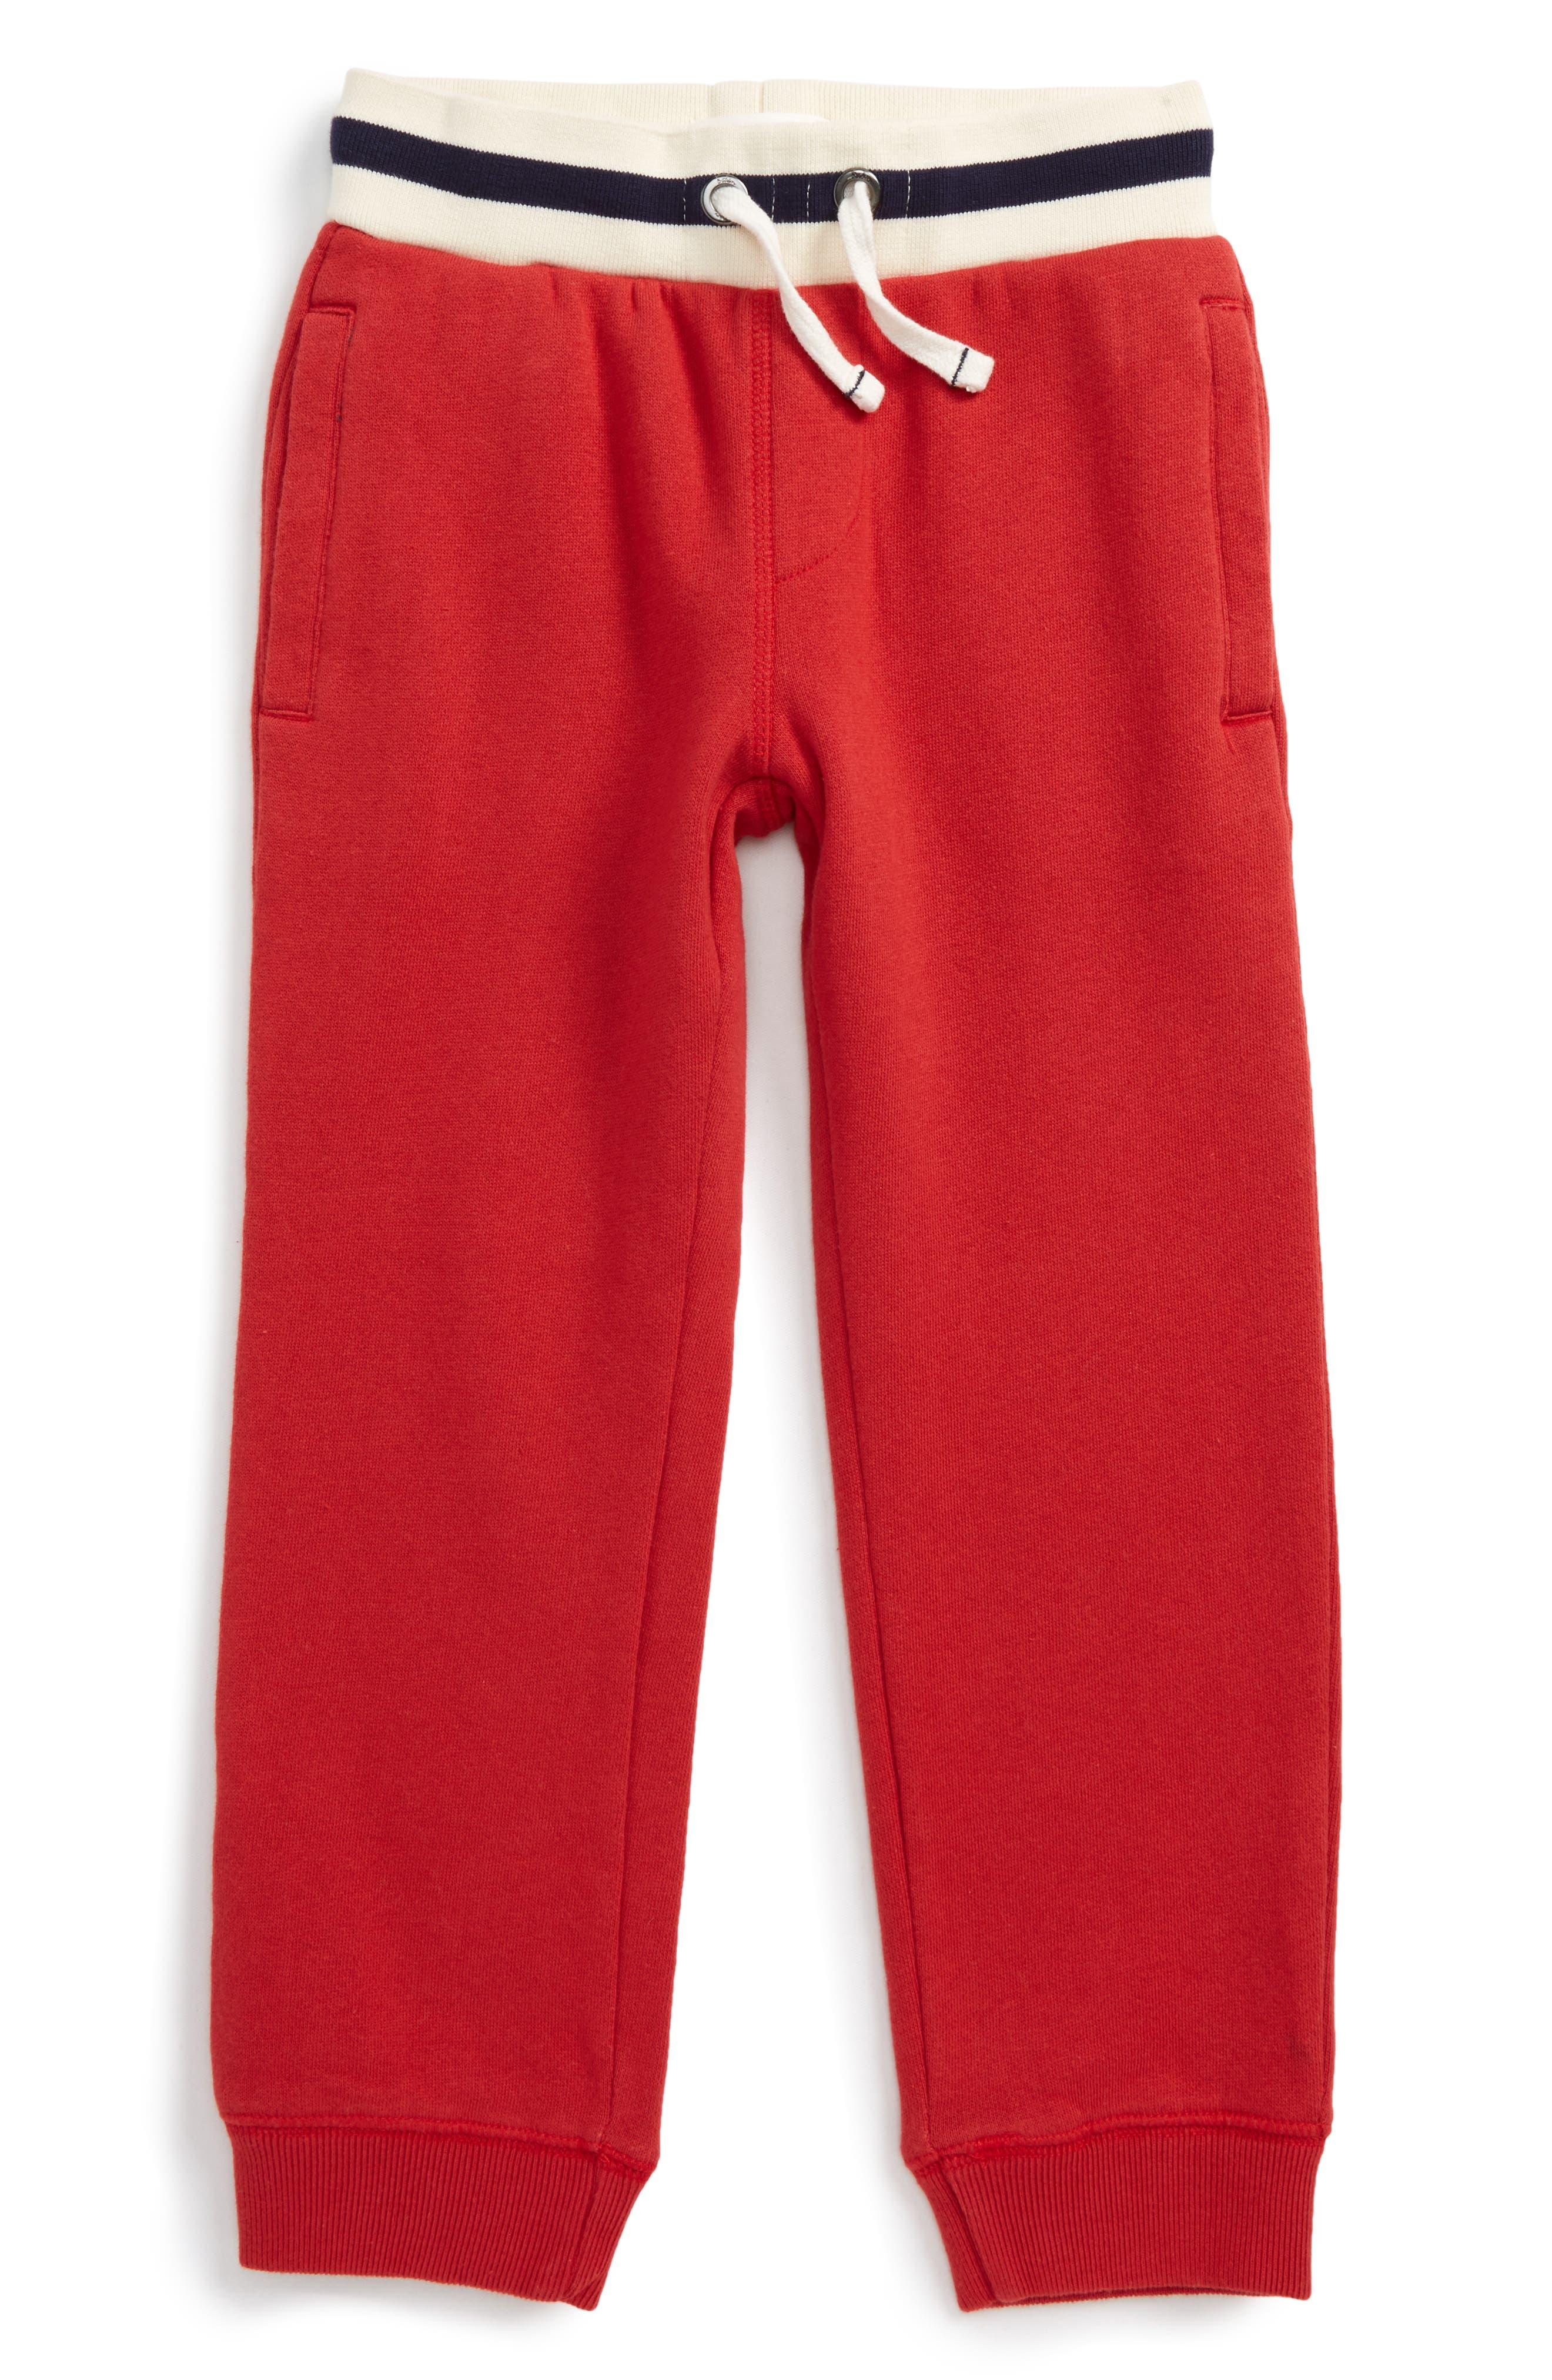 Alternate Image 1 Selected - Mini Boden Everyday Jogger Pants (Toddler Boys, Little Boys & Big Boys)